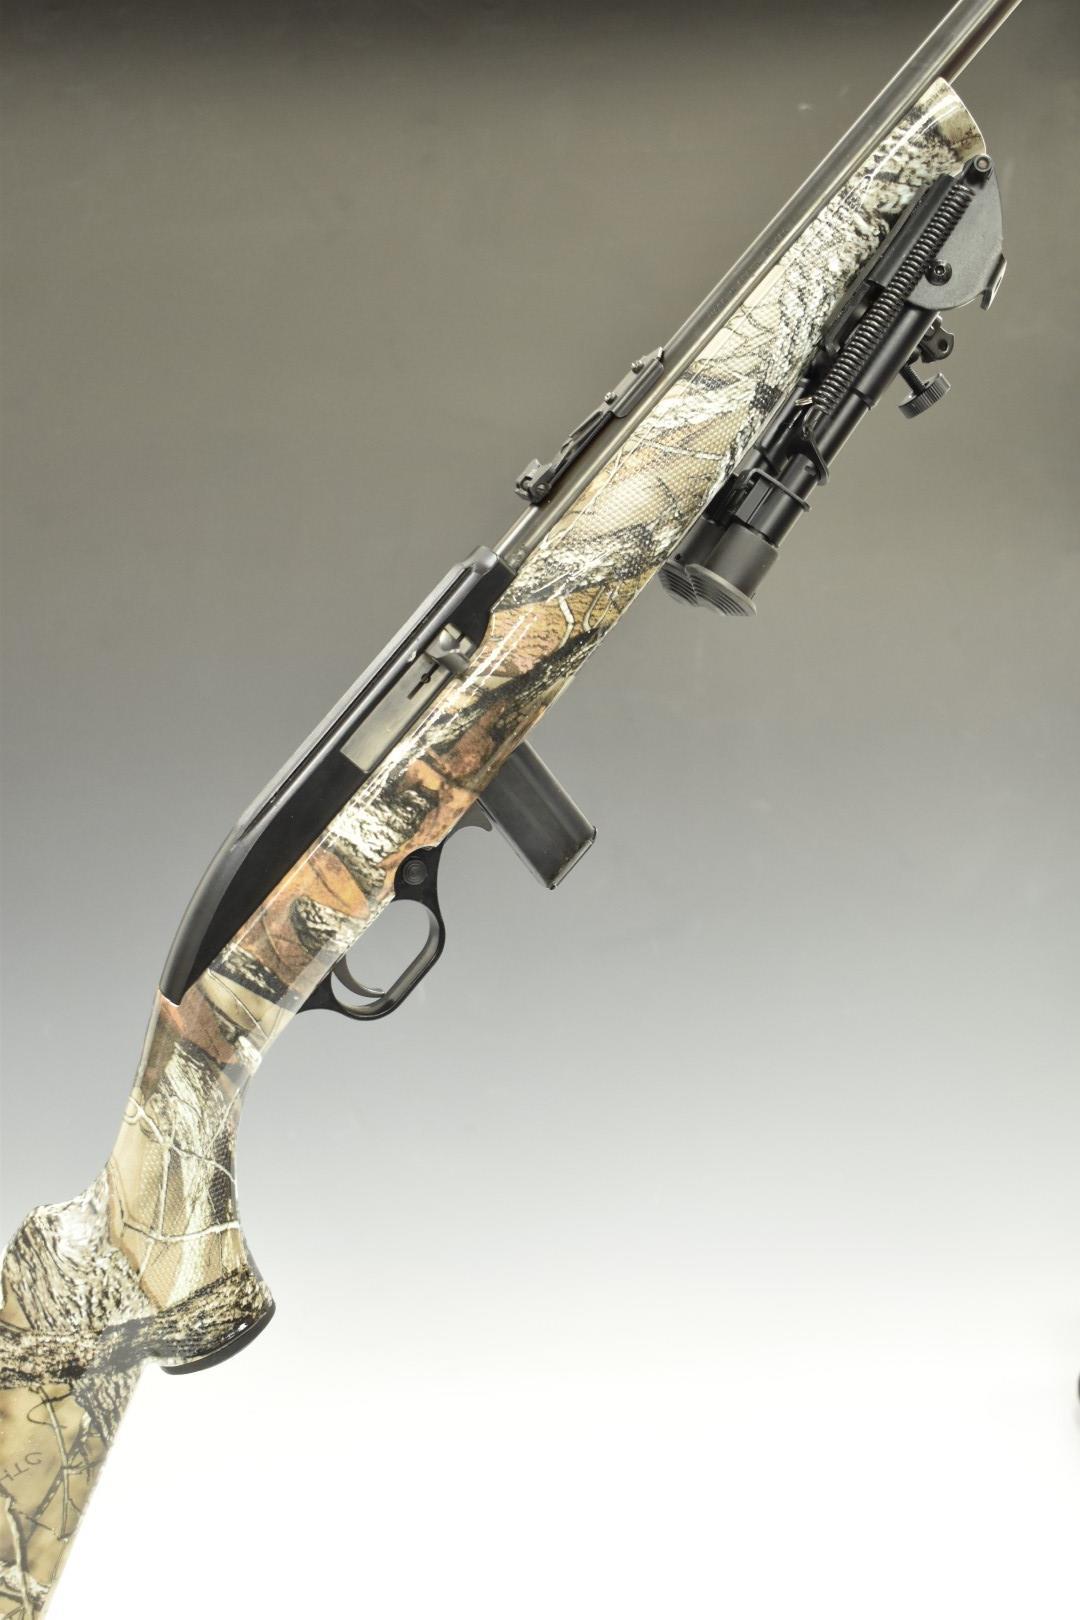 CBC Magtech Model 7022 .22 semi-automatic rifle with chequered semi-pistol grip, magazine, bi-pod,